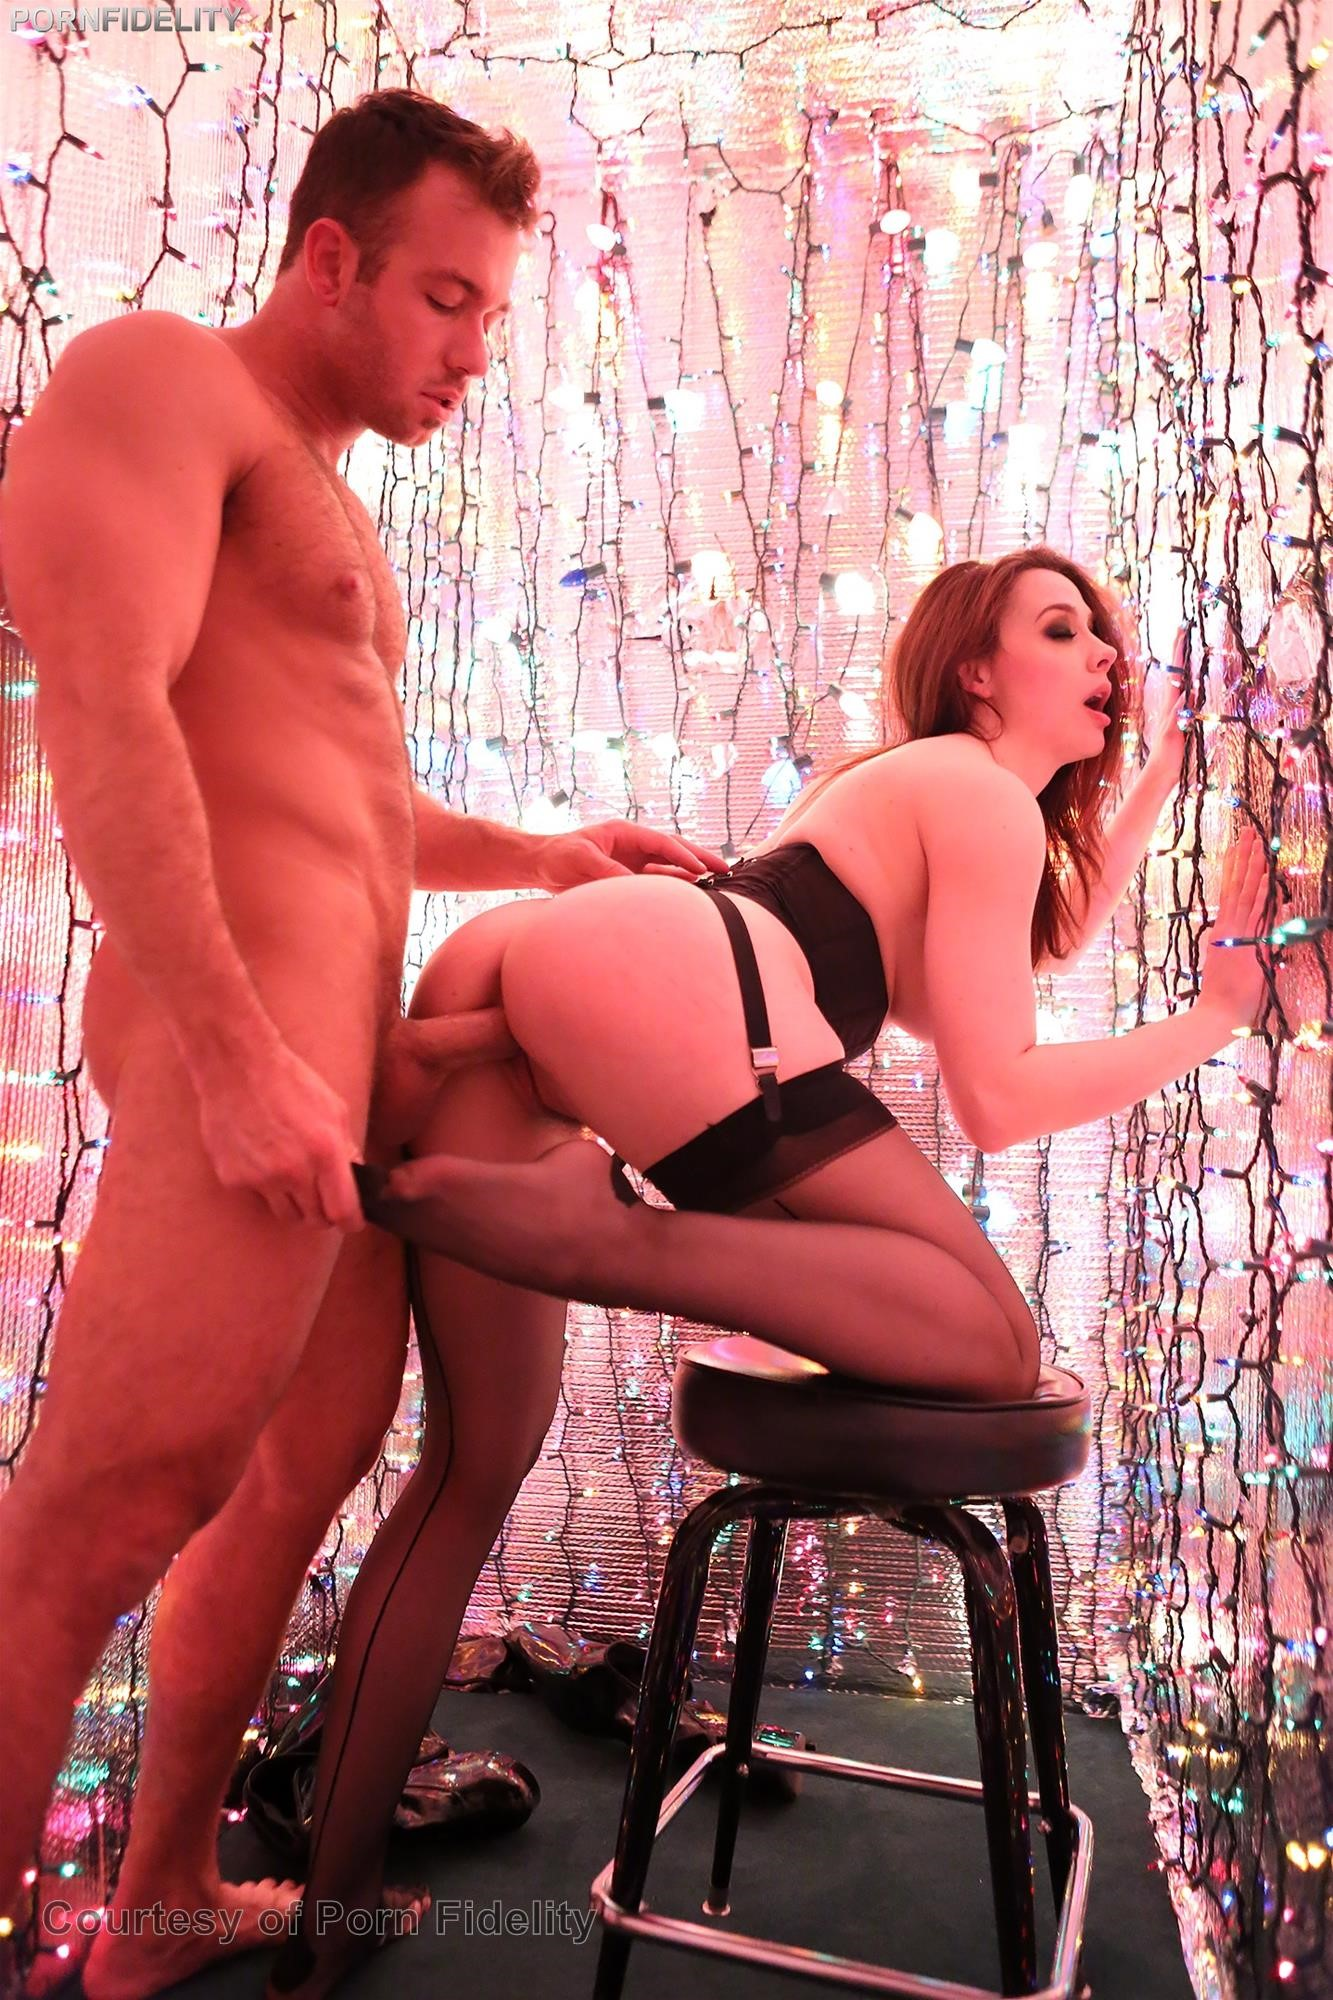 Kayleigh Pearson Sex Classy hot naked guys blog